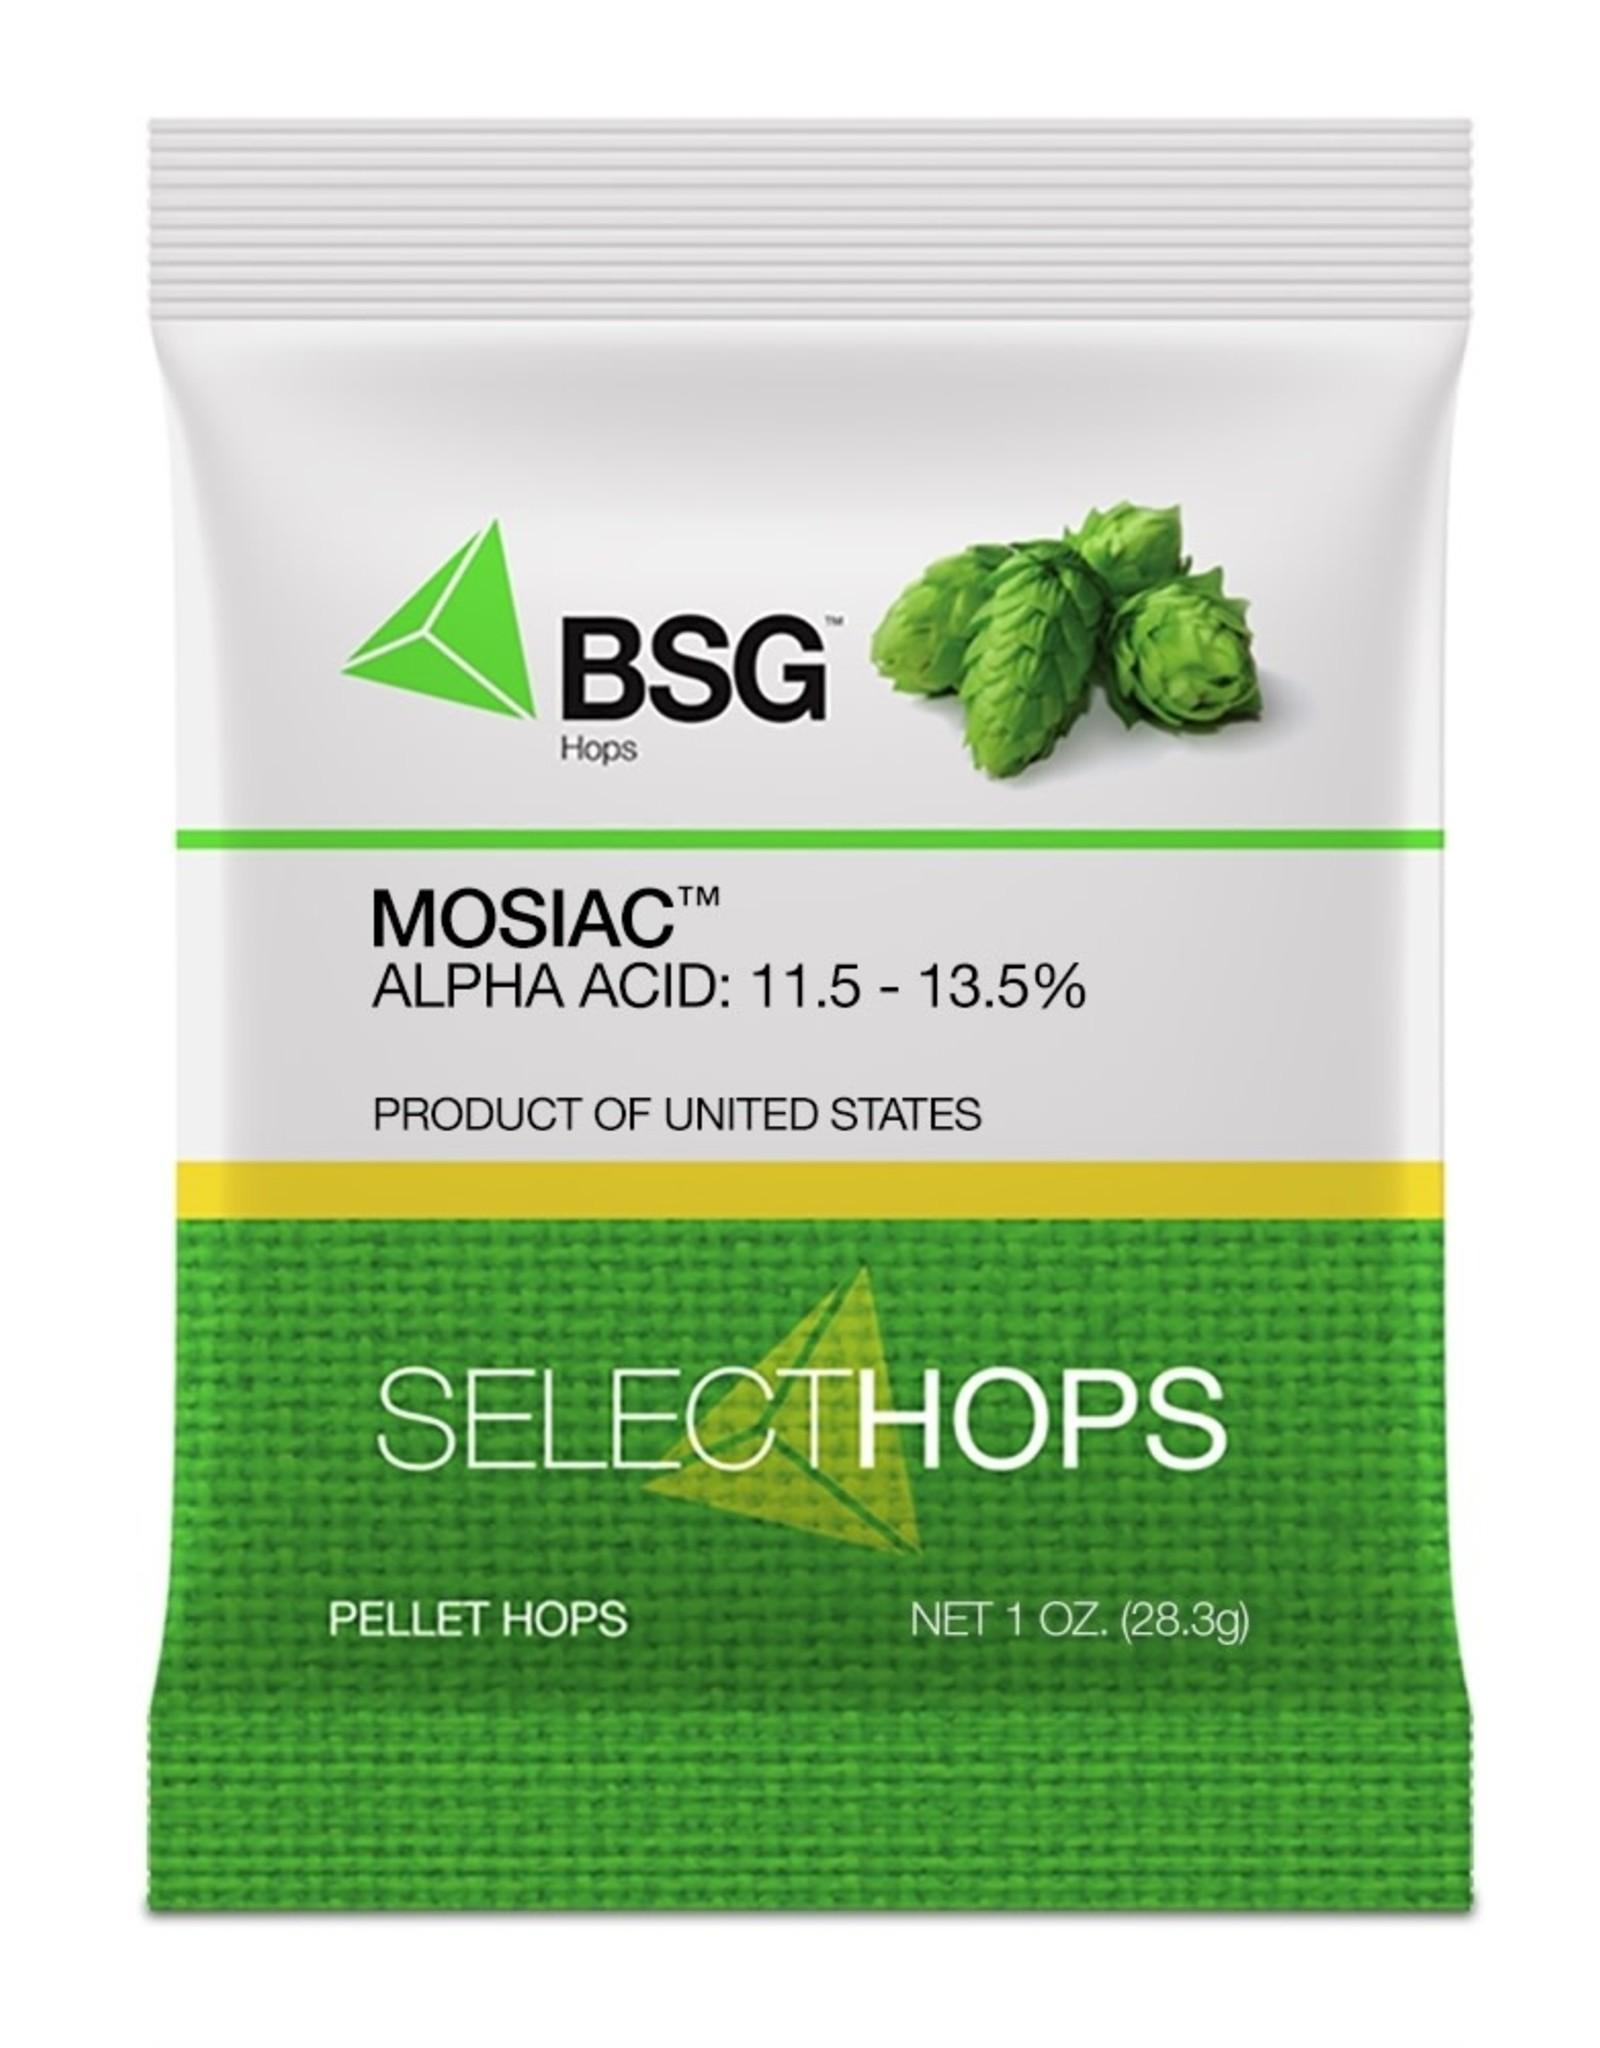 MOSAIC hop pellets- 1 oz. pkg